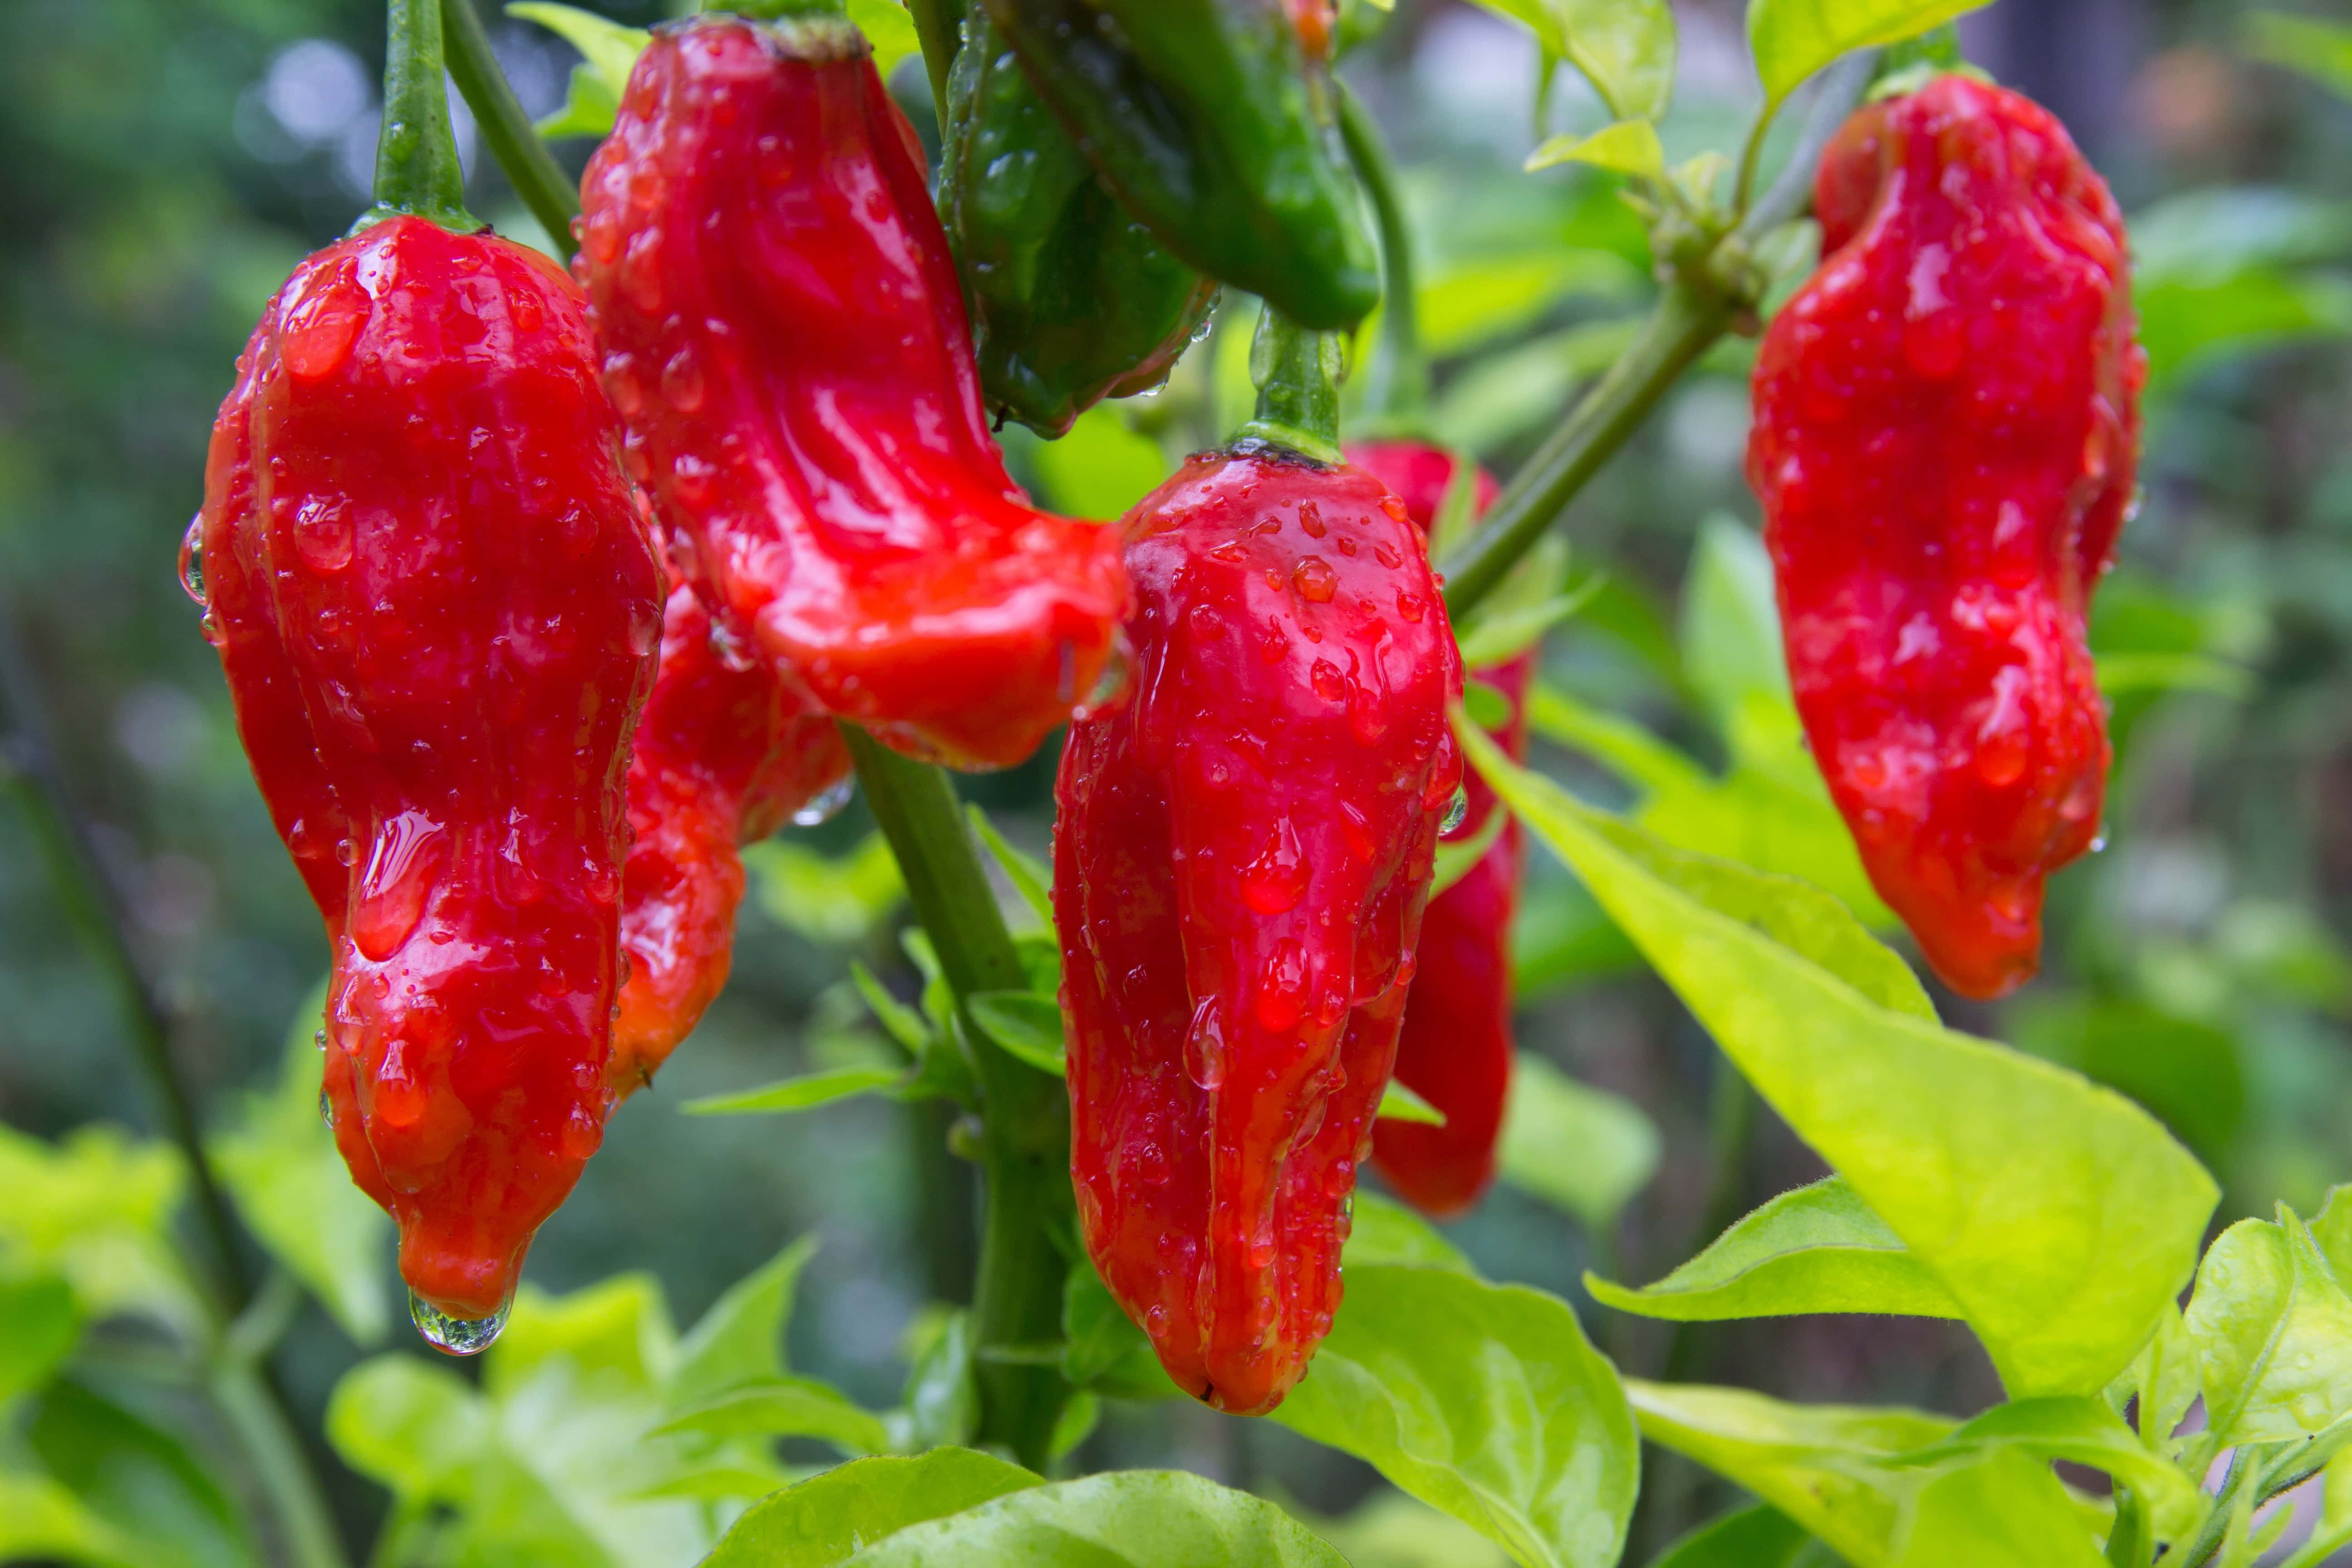 ghost peppers, bhut jolokias